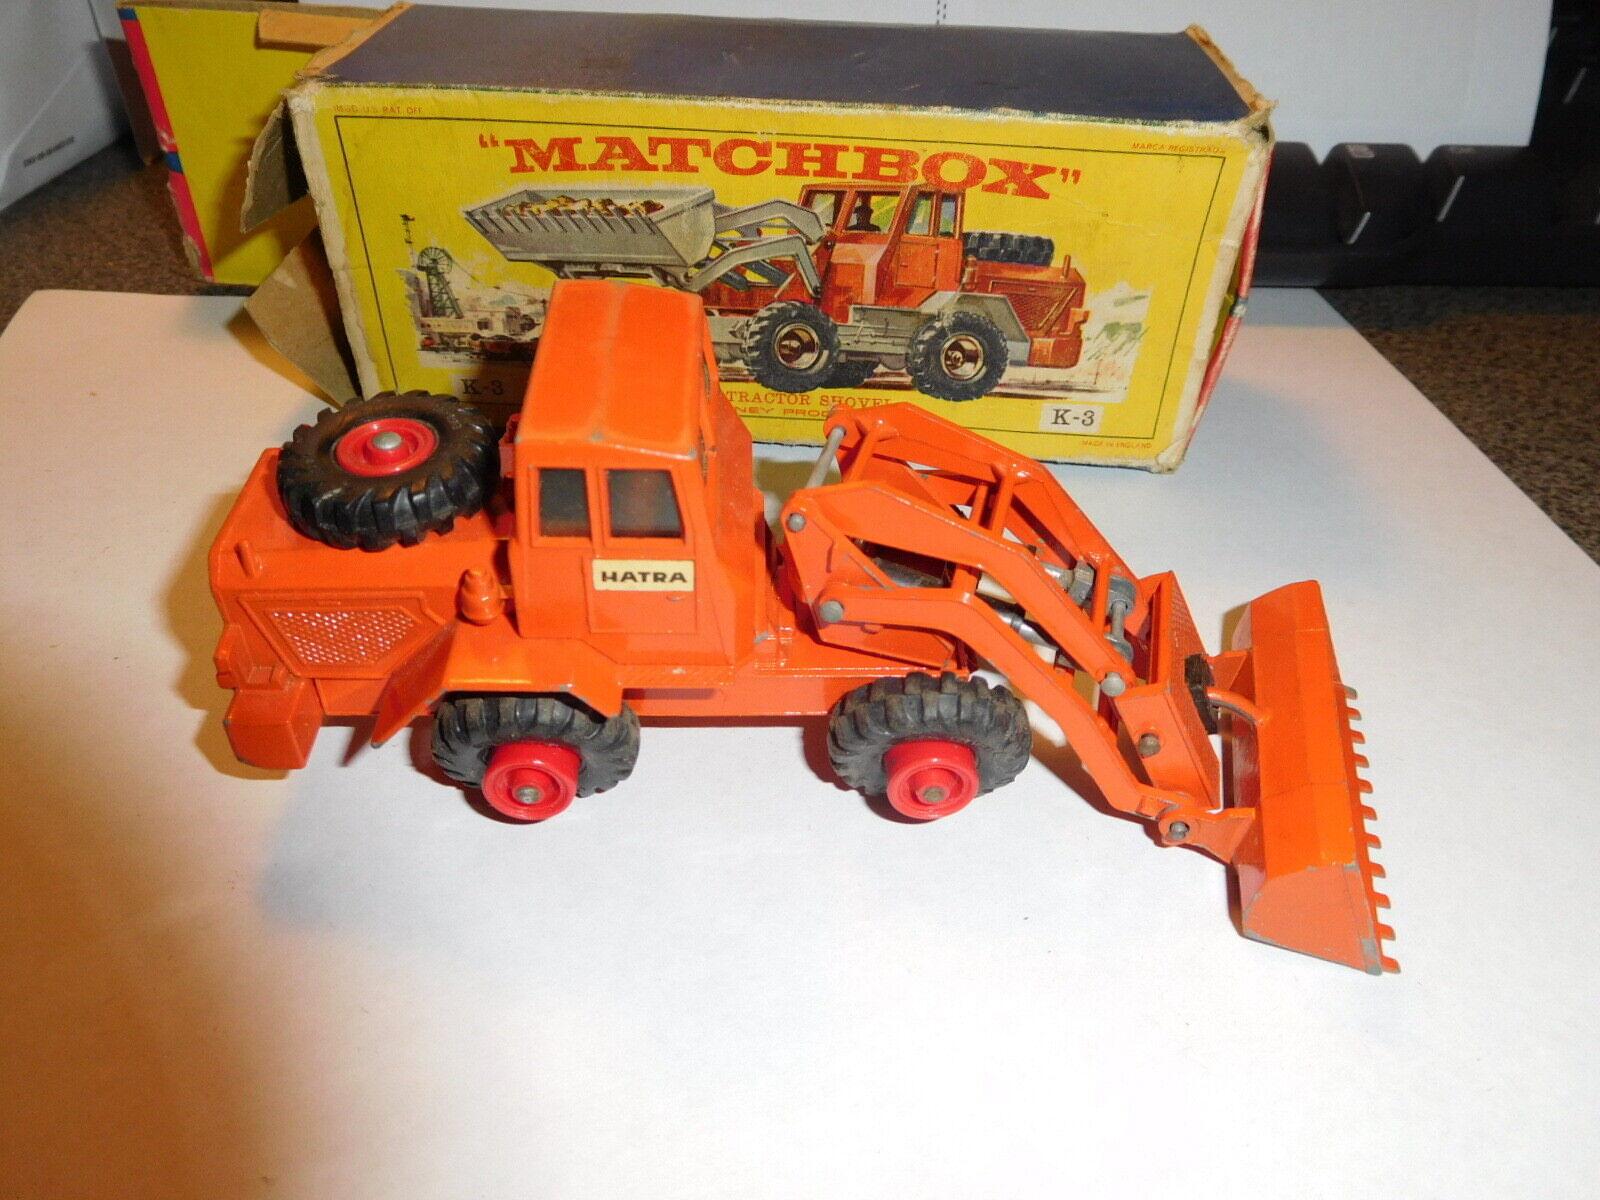 Matchbox Lesney K-3 harta Tractor Pala King Talla Caja y vehículo